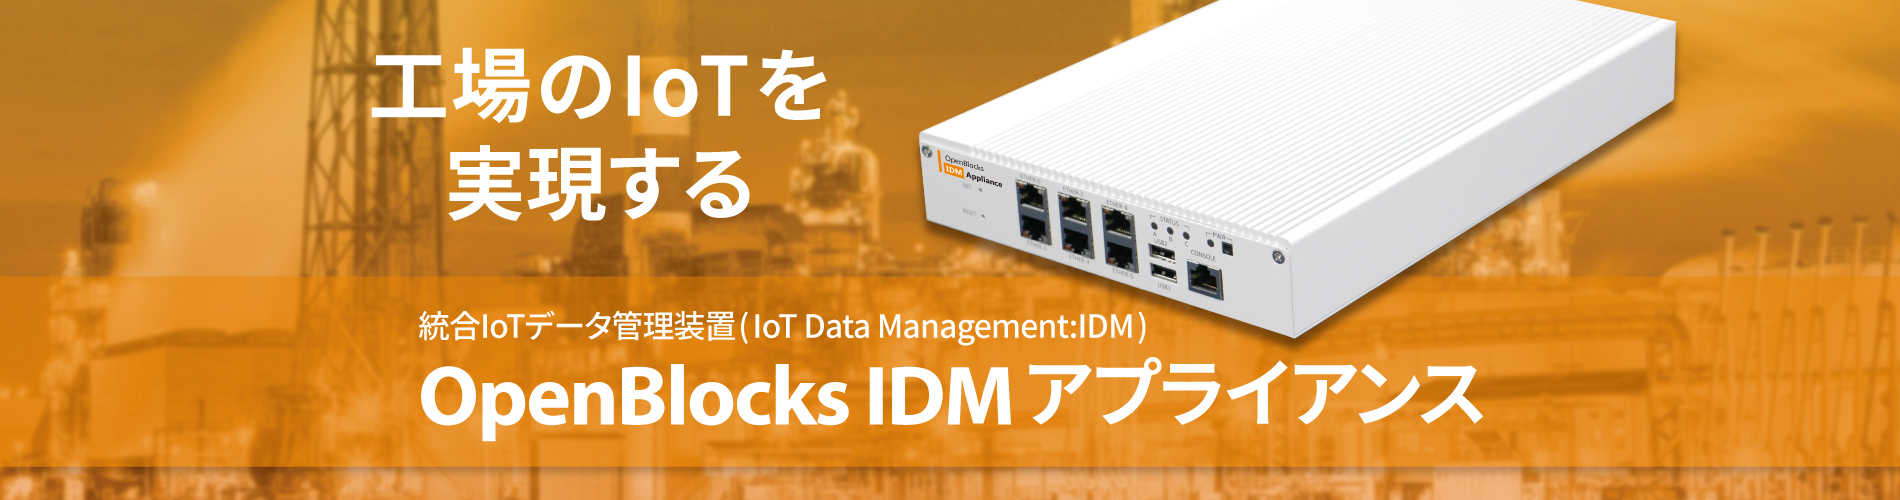 OpenBlocks IDM アプライアンス 工場のIoTを実現する 総合IoTデータ管理装置(IoT Data Management:IDM)